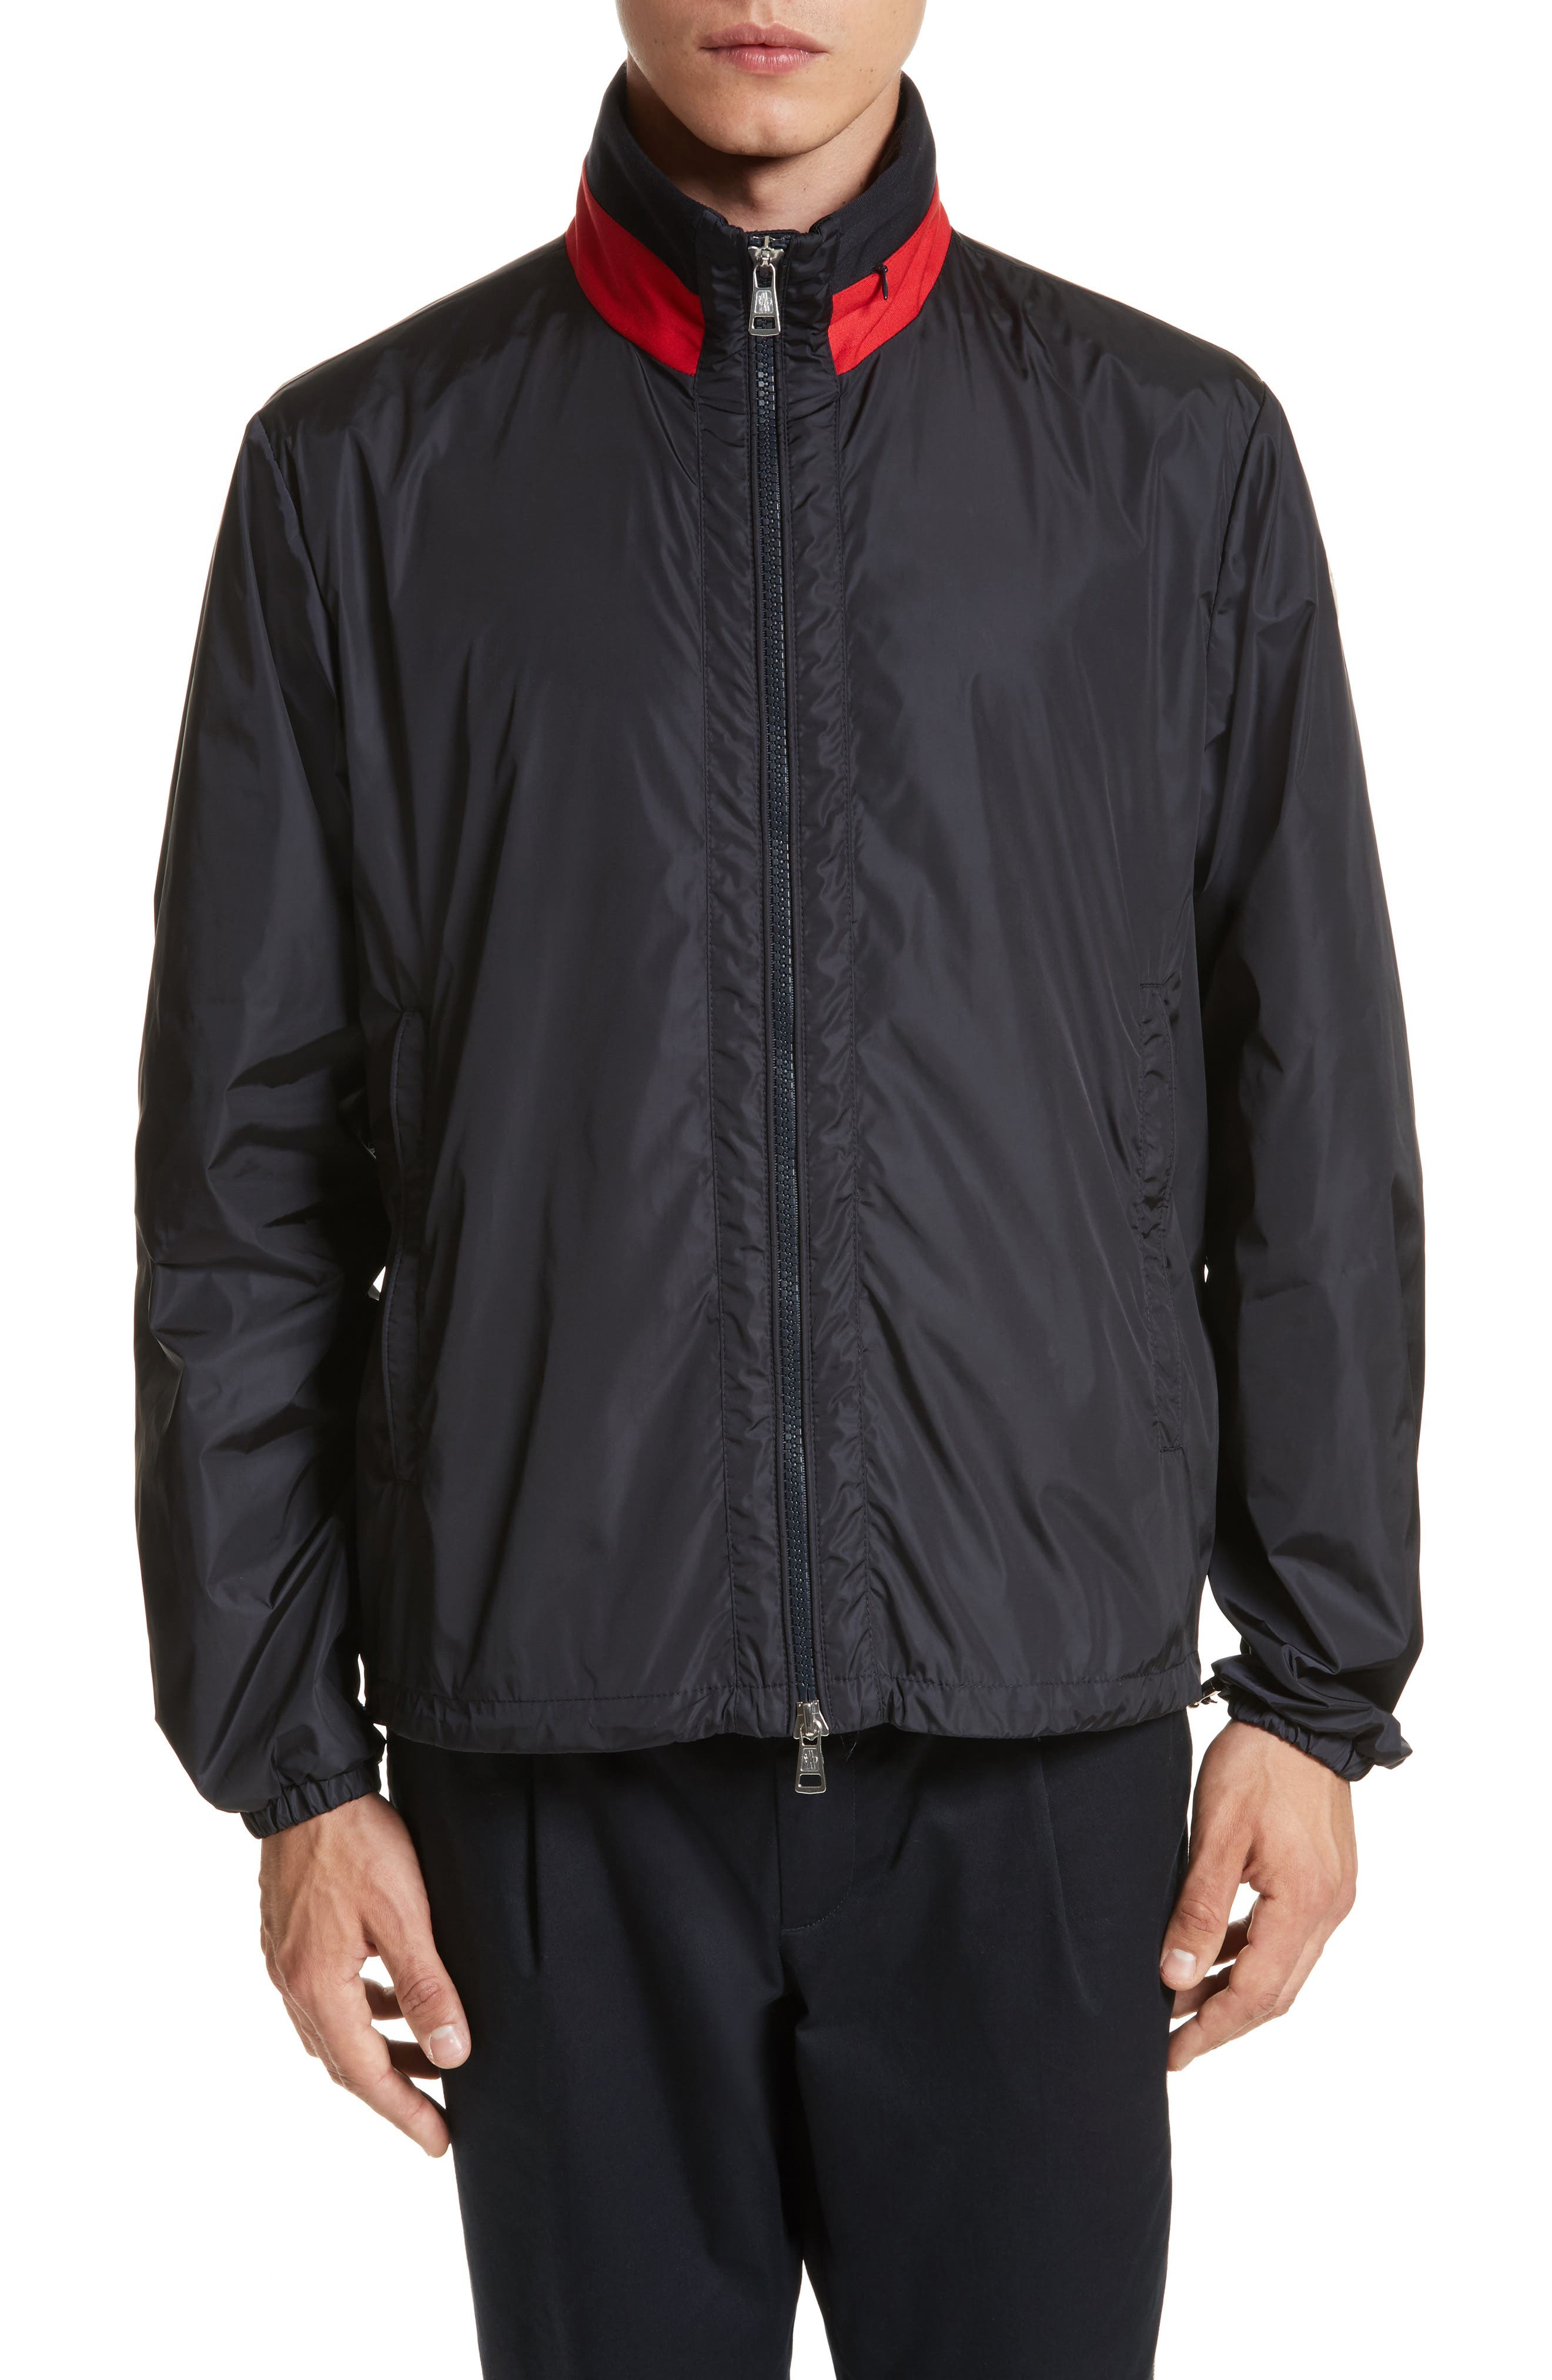 Goulier Nylon Jacket,                             Main thumbnail 1, color,                             Navy